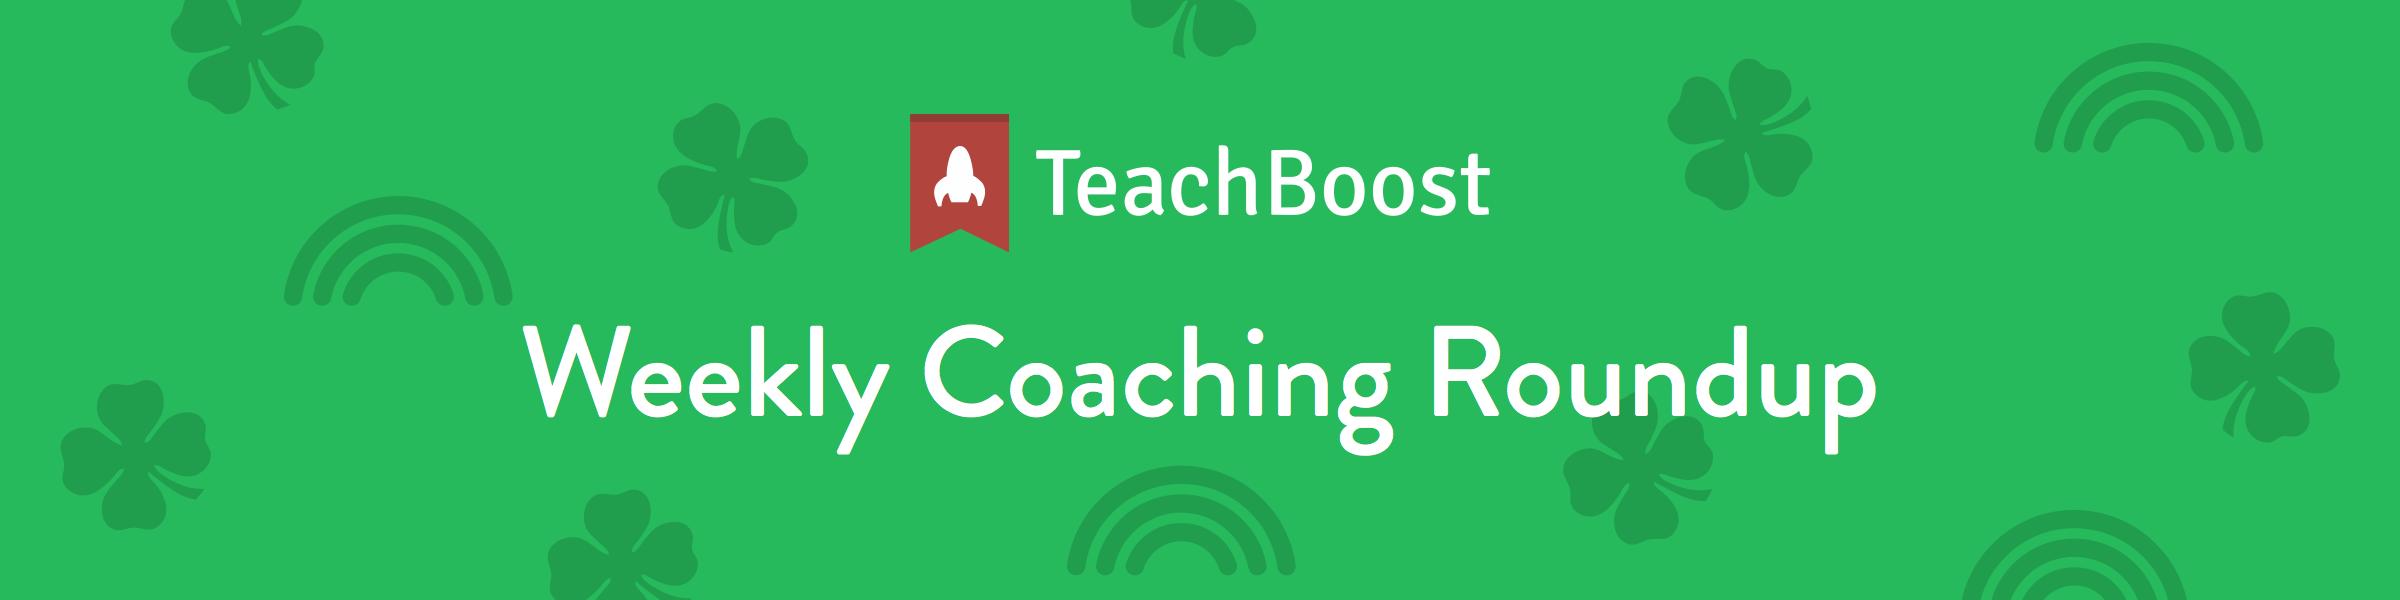 Weekly Coaching Roundup - March 2019 (Half) (Seasonal)